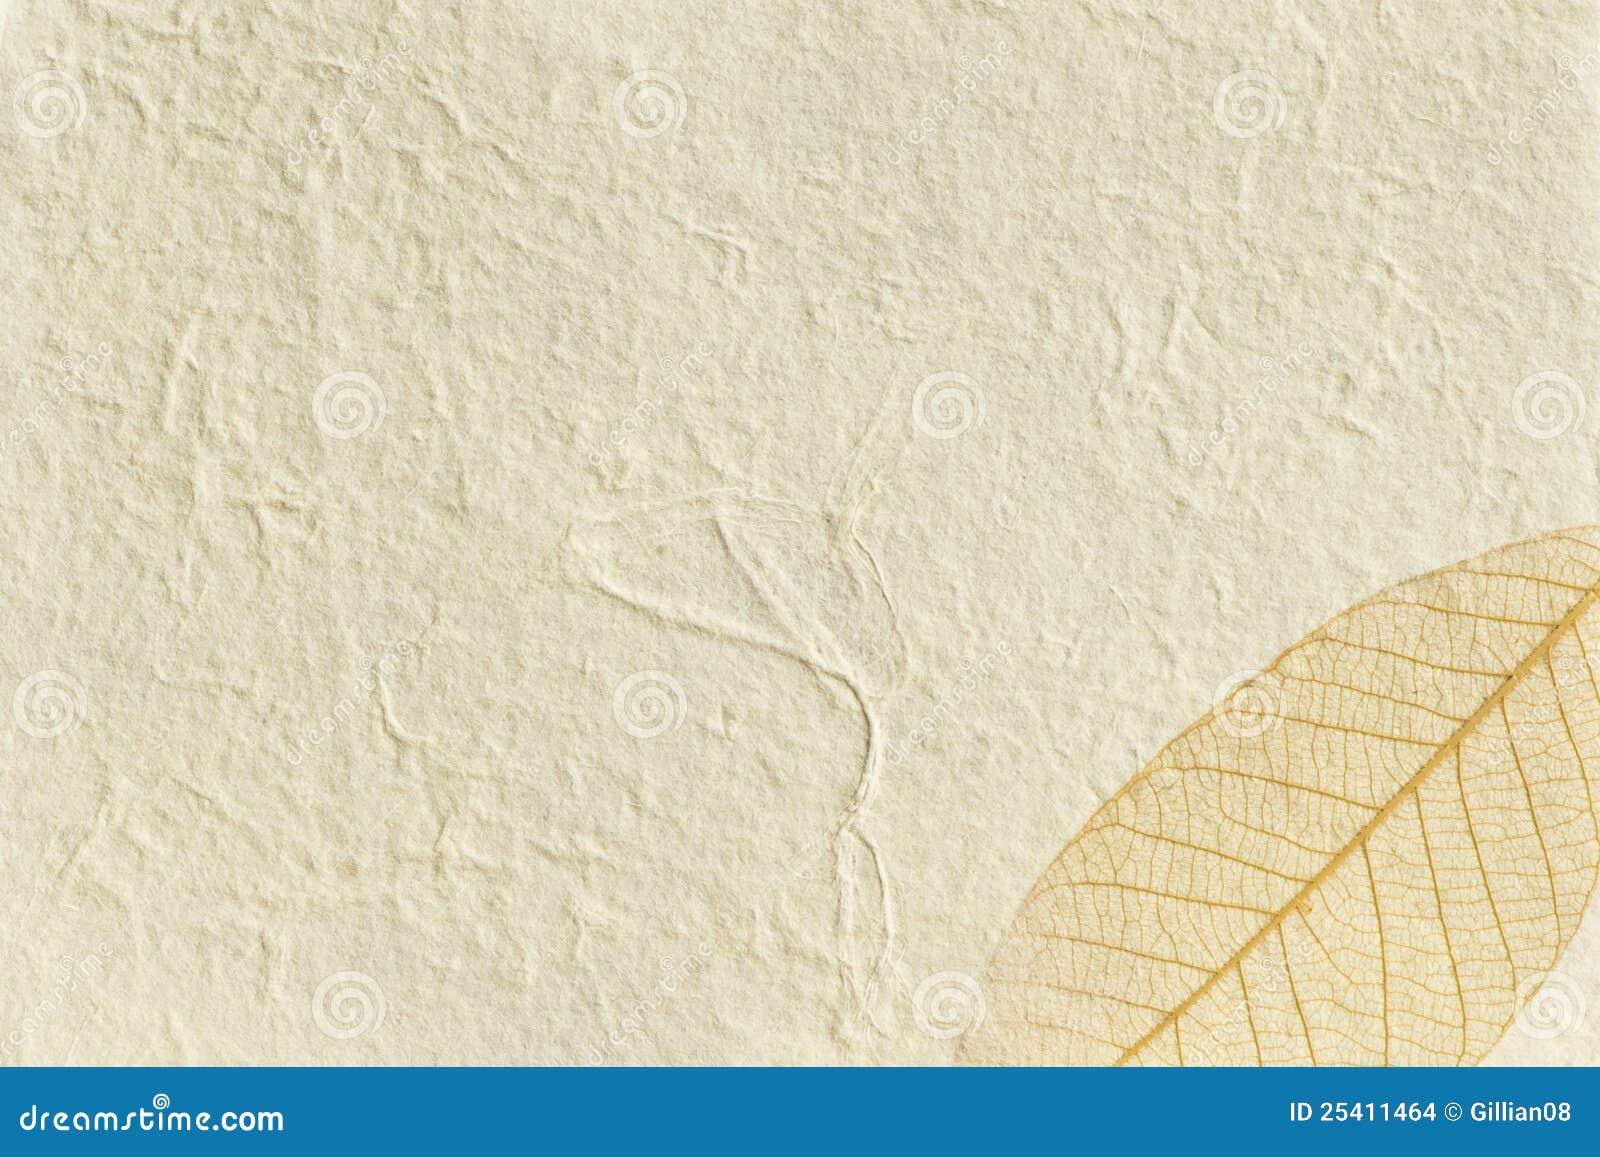 textured paper gold leaf stock photo image of nobody. Black Bedroom Furniture Sets. Home Design Ideas